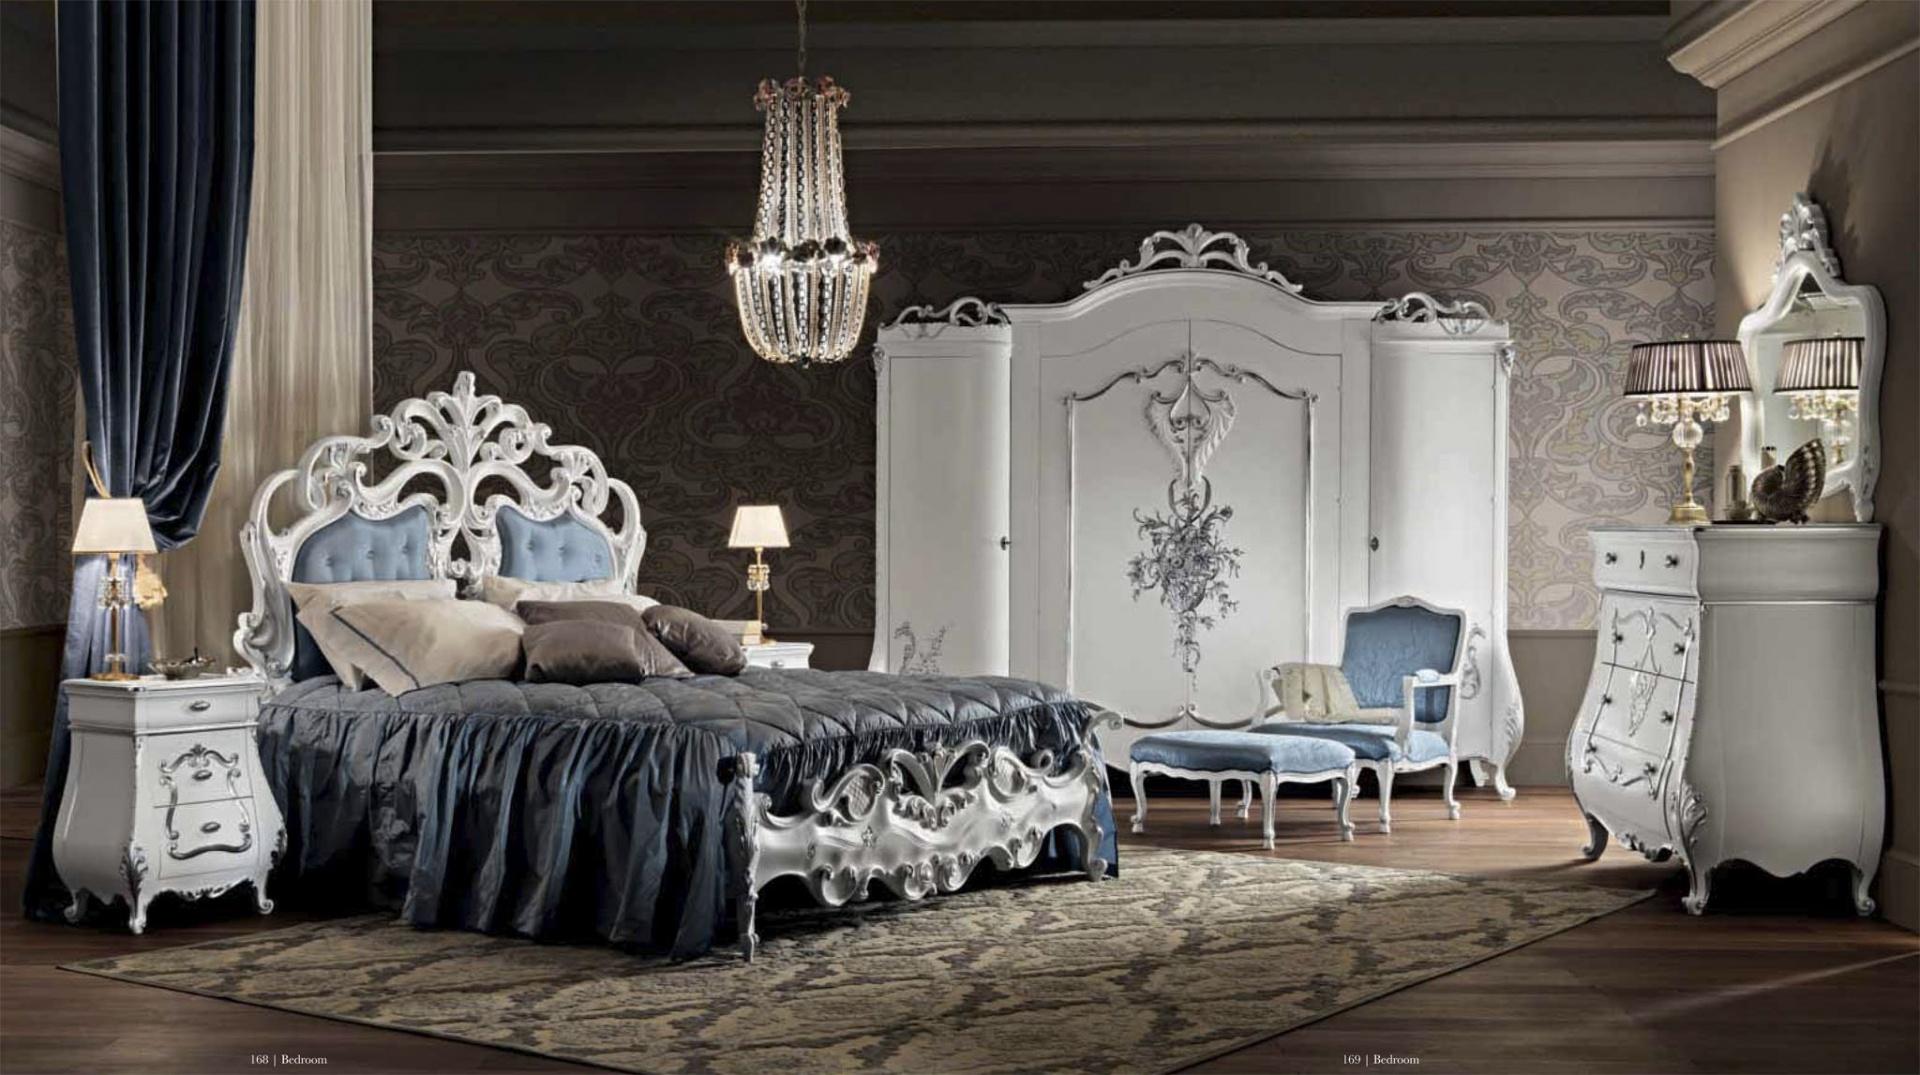 ViILLA VENEZIA мебель для спальни IM379